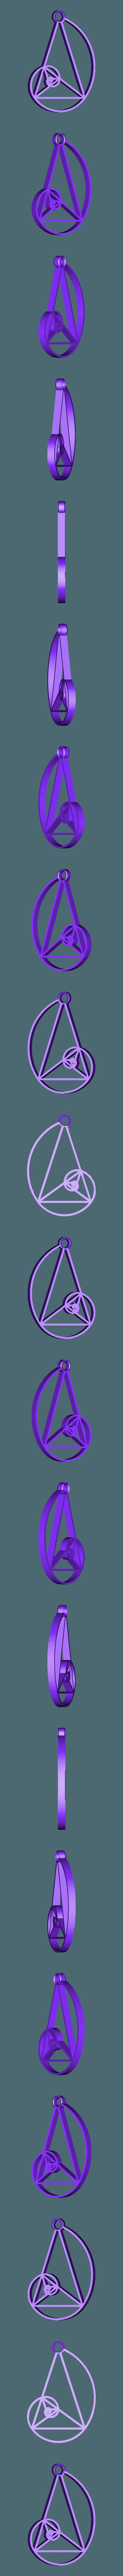 LogaSpiral60mm.stl Download free STL file Logarithmic Spiral, Golden Triangle, Golden Gnomon, Spira Mirabilis • 3D print object, LGBU